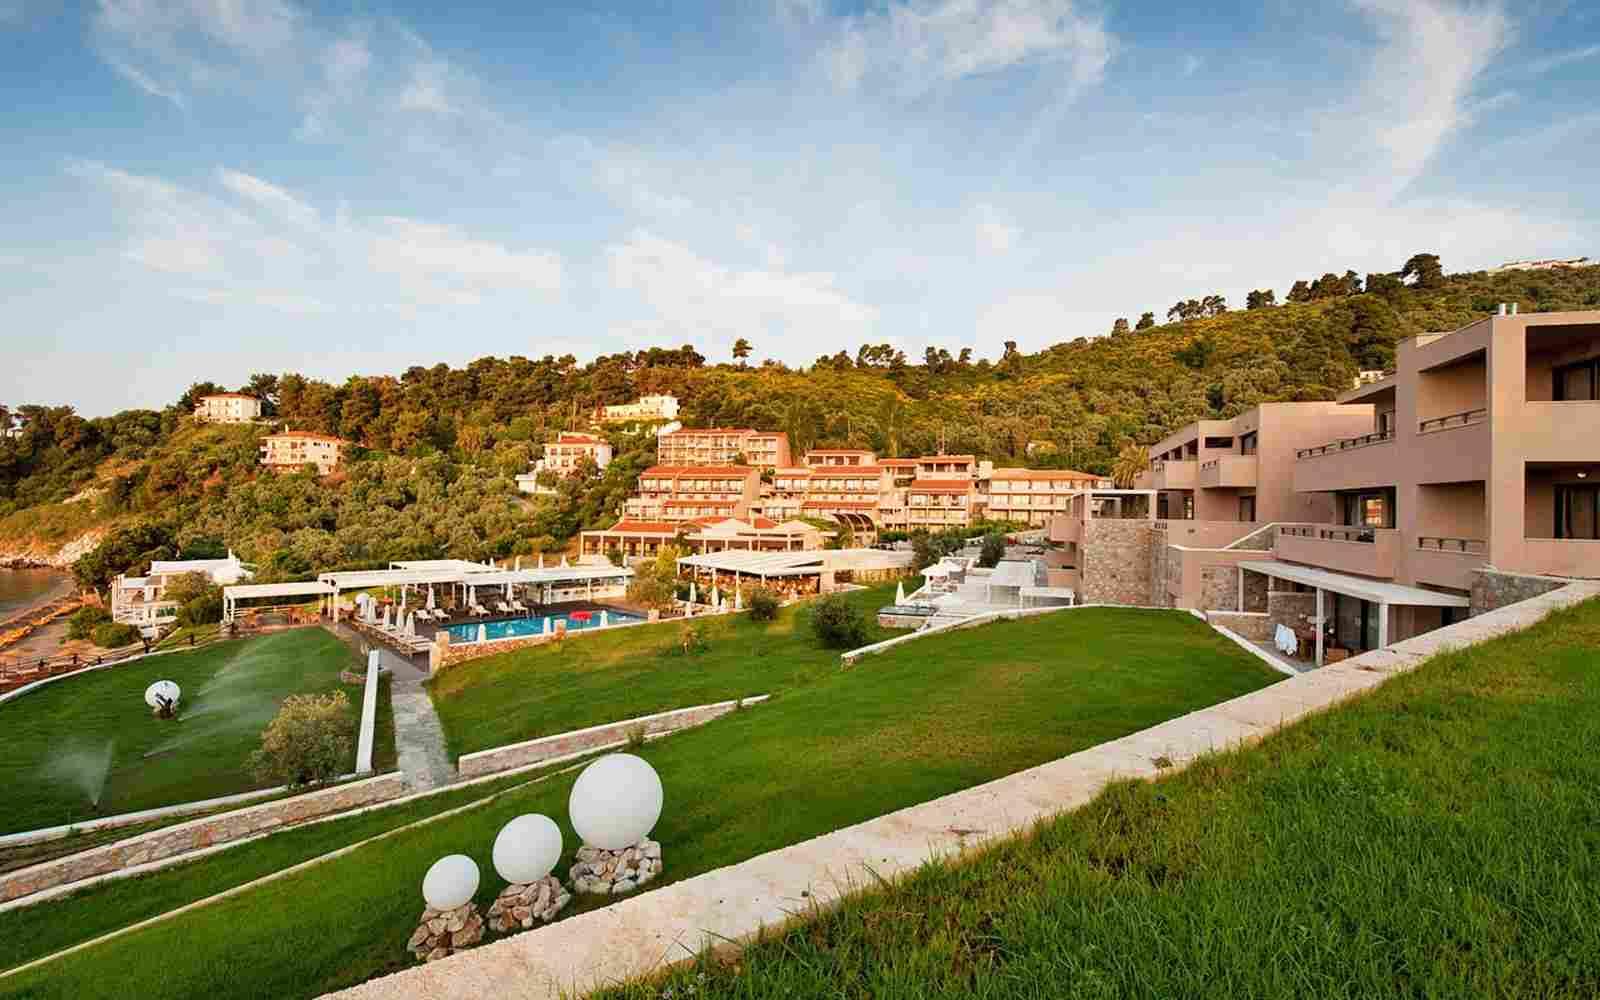 https://www.bellacosta.org/wp-content/uploads/2016/03/summer-hotel-02.jpg